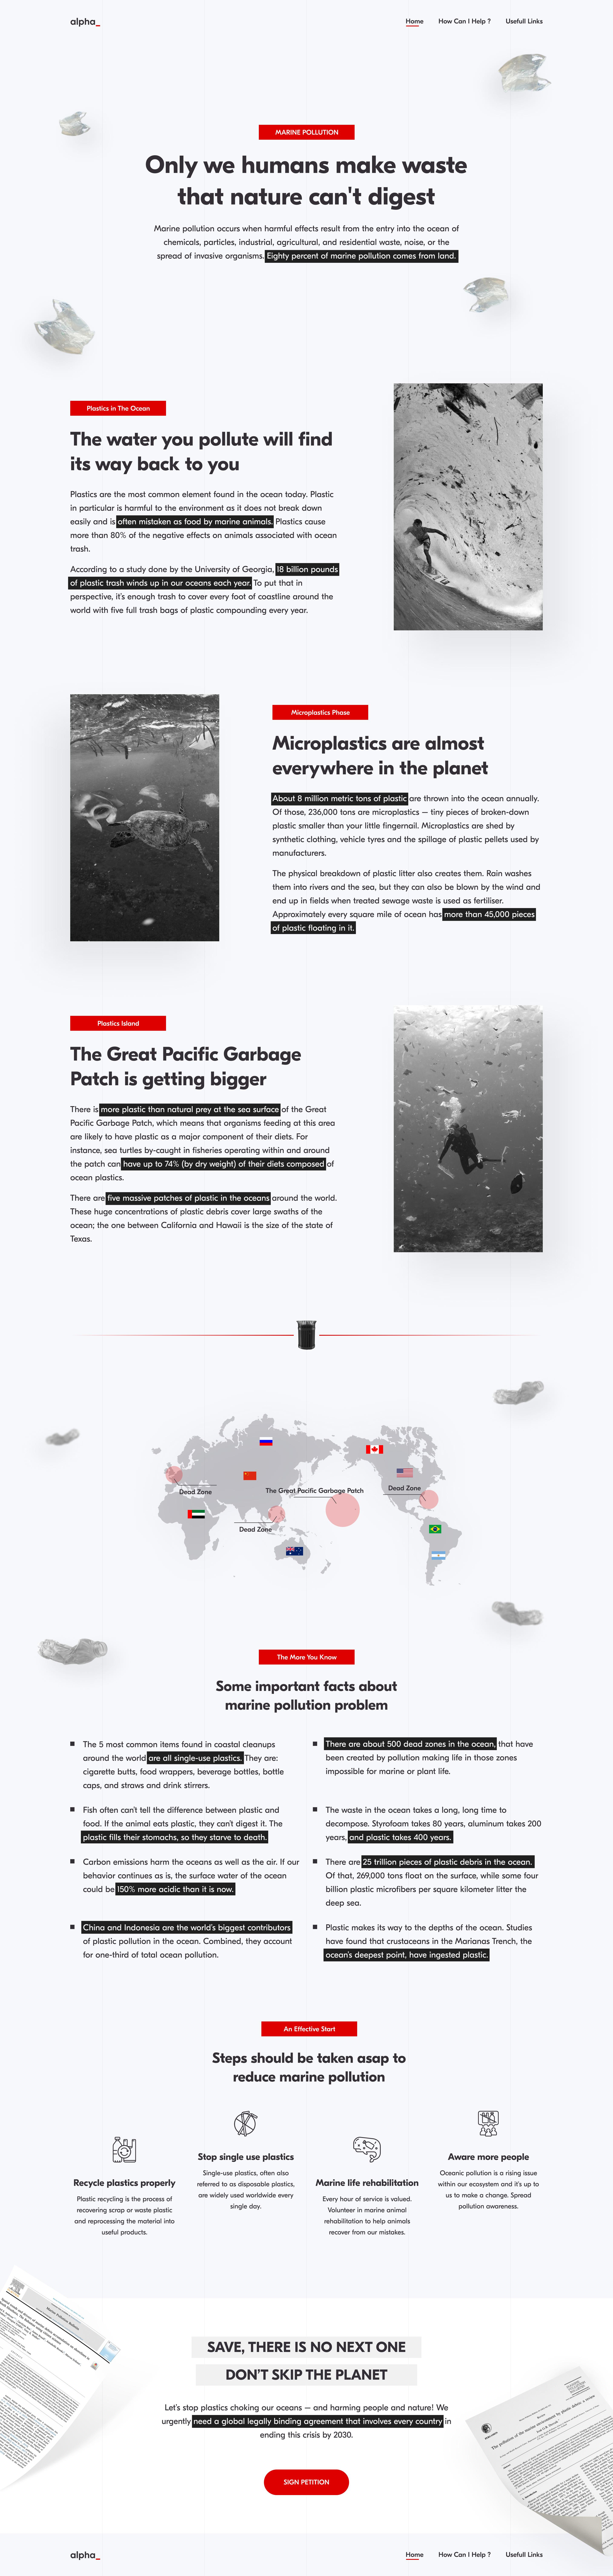 Marine pollution 2x